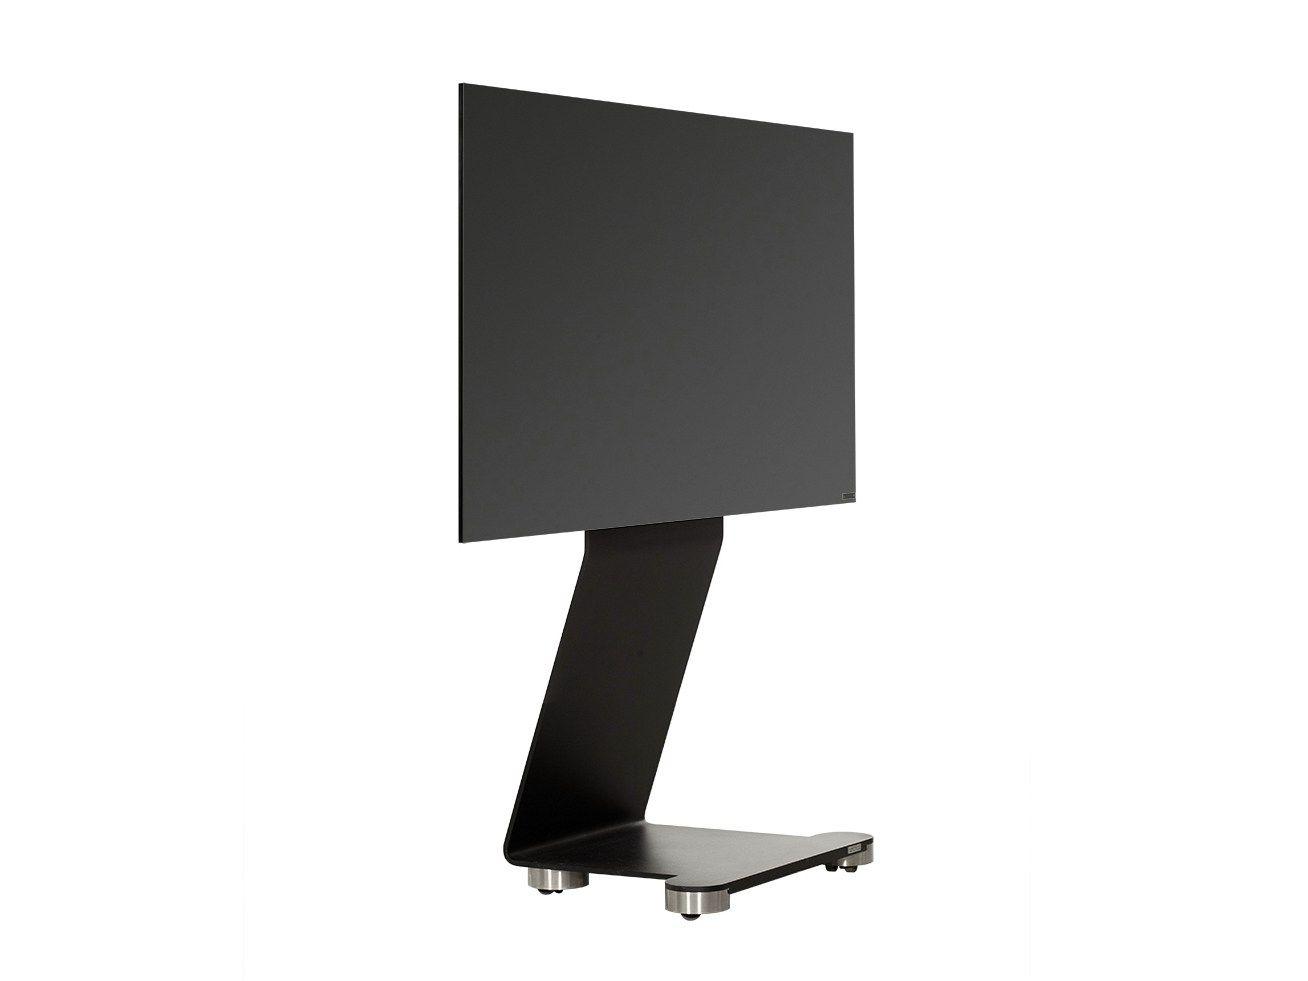 120 Meuble Tv Tvs # Modele Porte Tele